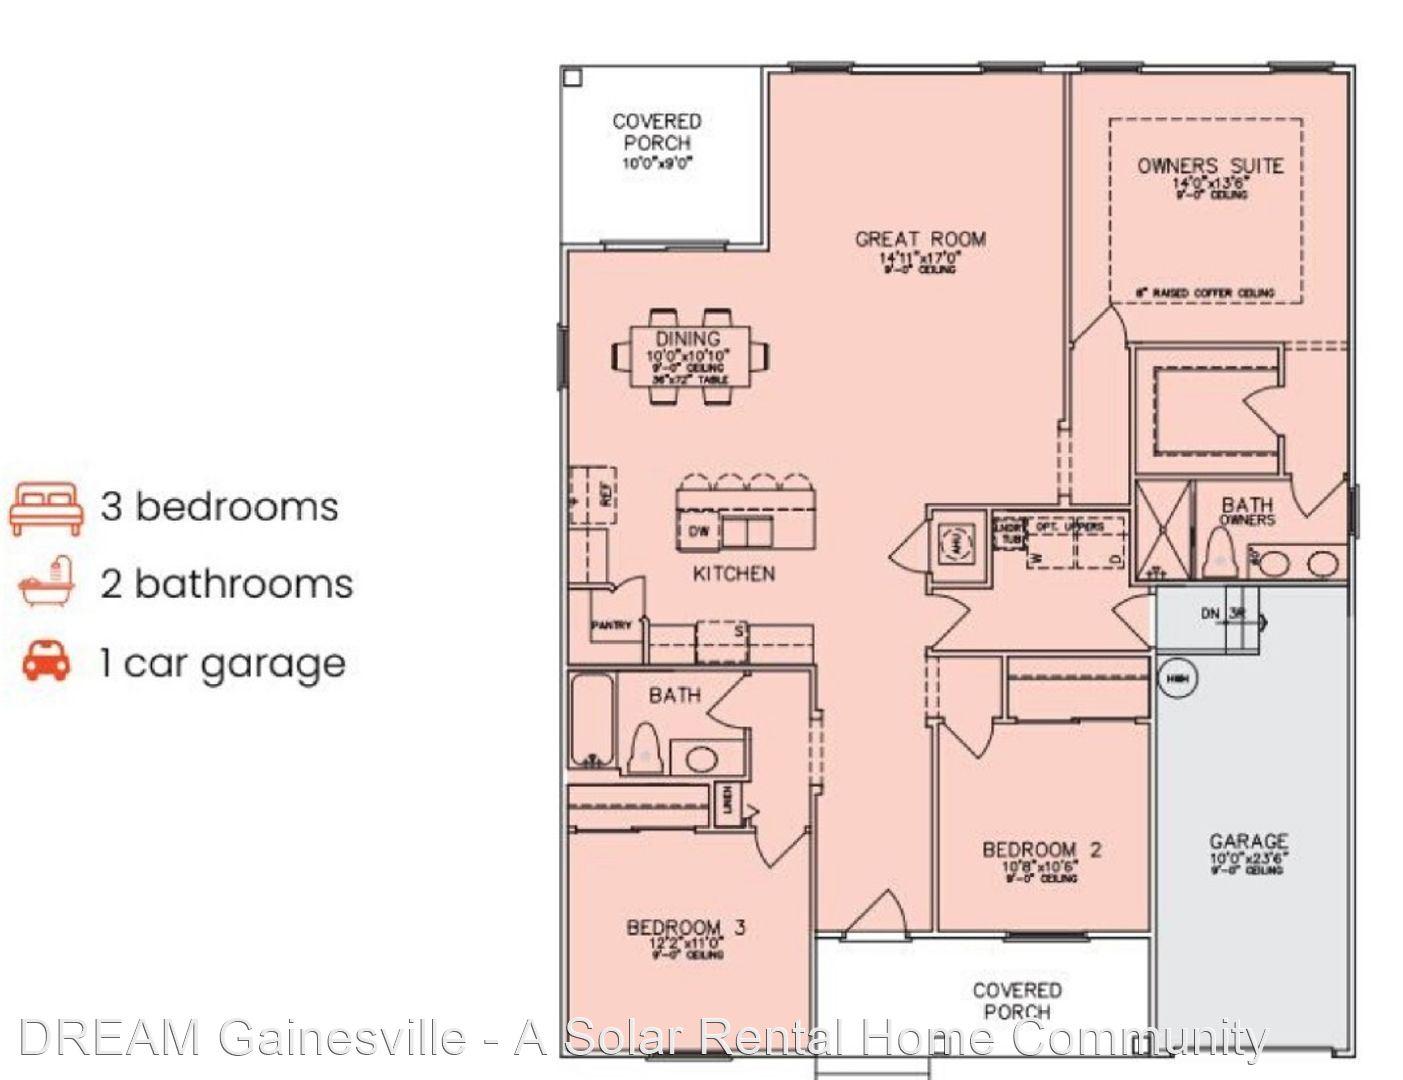 3583 NE 1ST DR, Gainsville, FL - $2,325